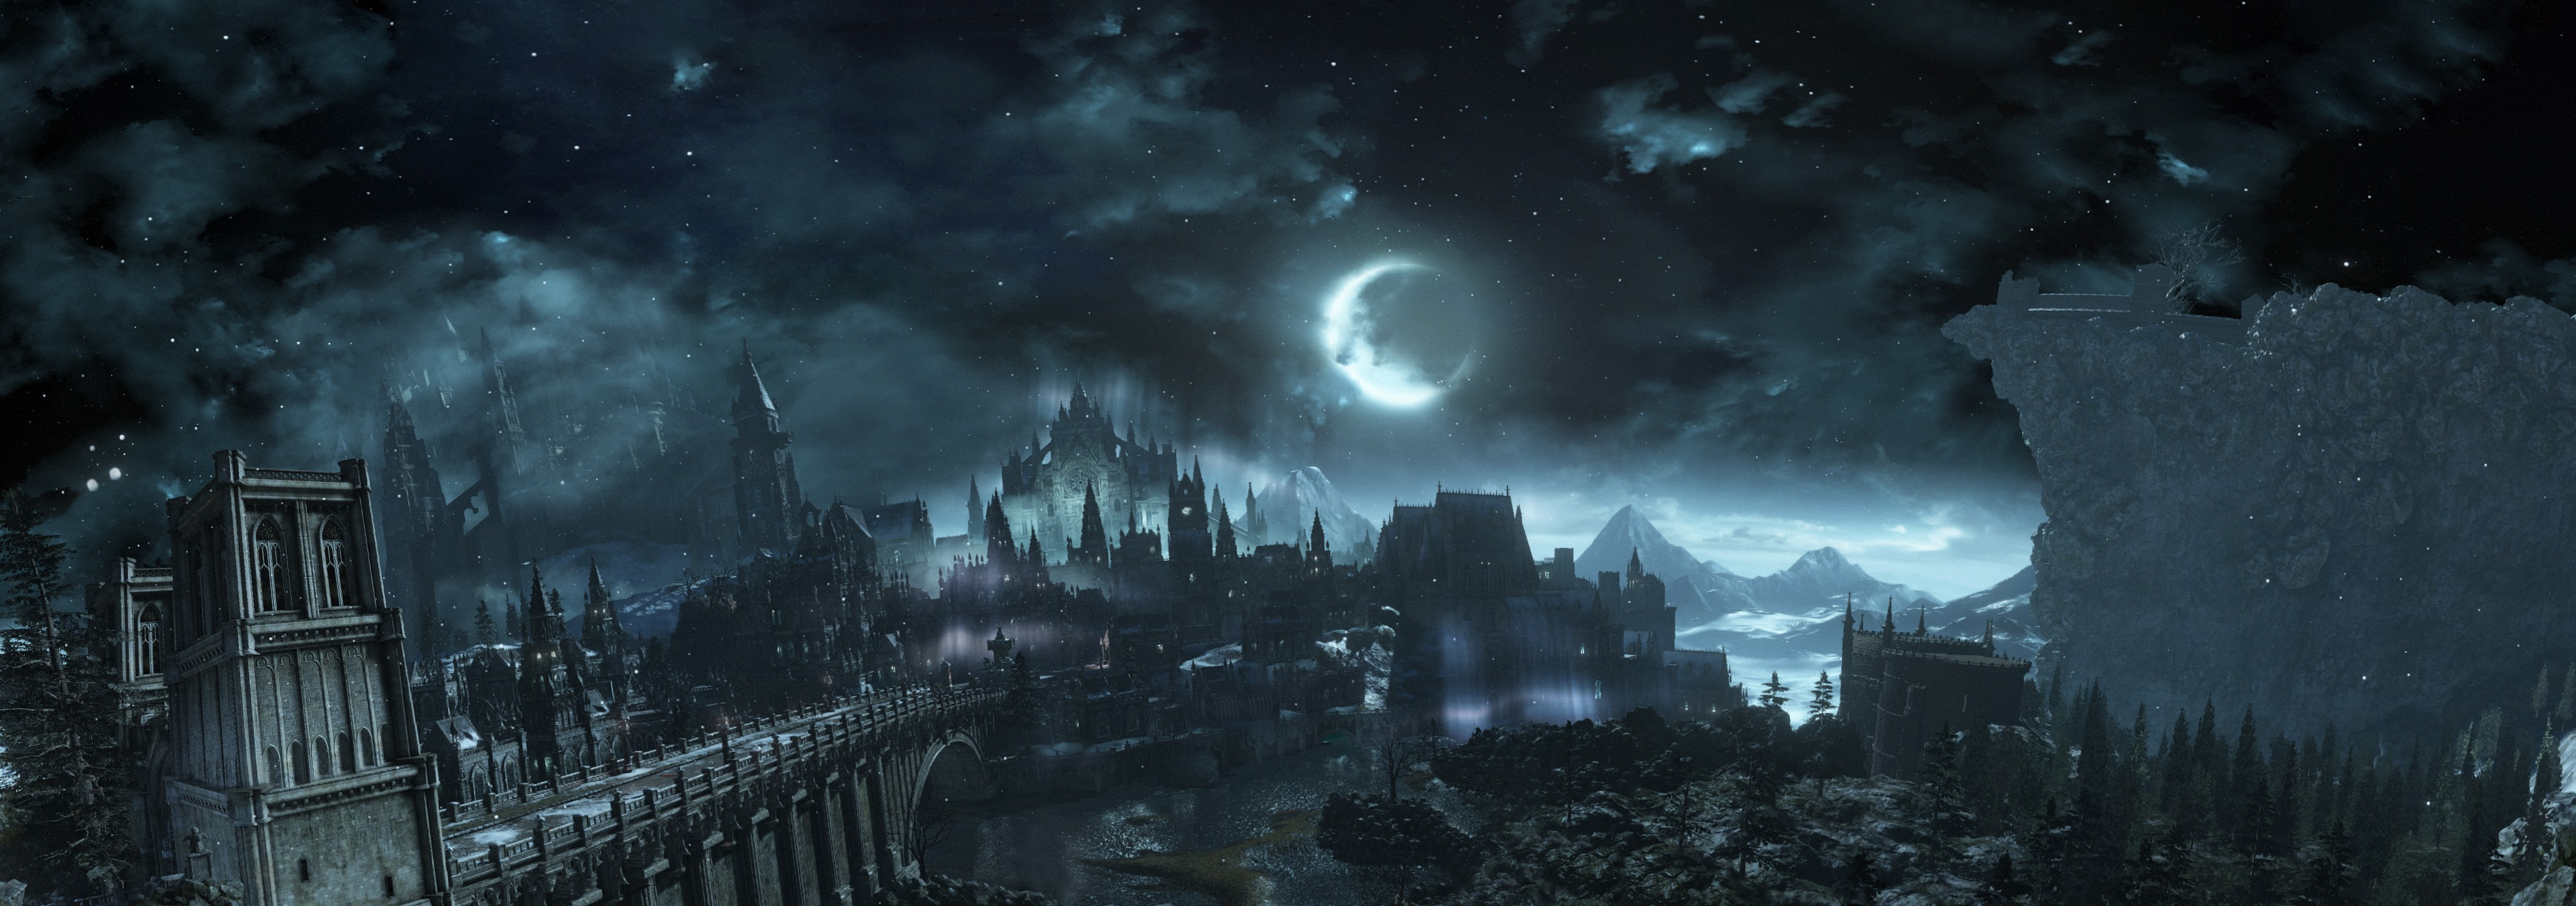 General 4096x1440 Dark Souls III Dark Souls castle dark fantasy night Moon video games sky clouds Irithyll